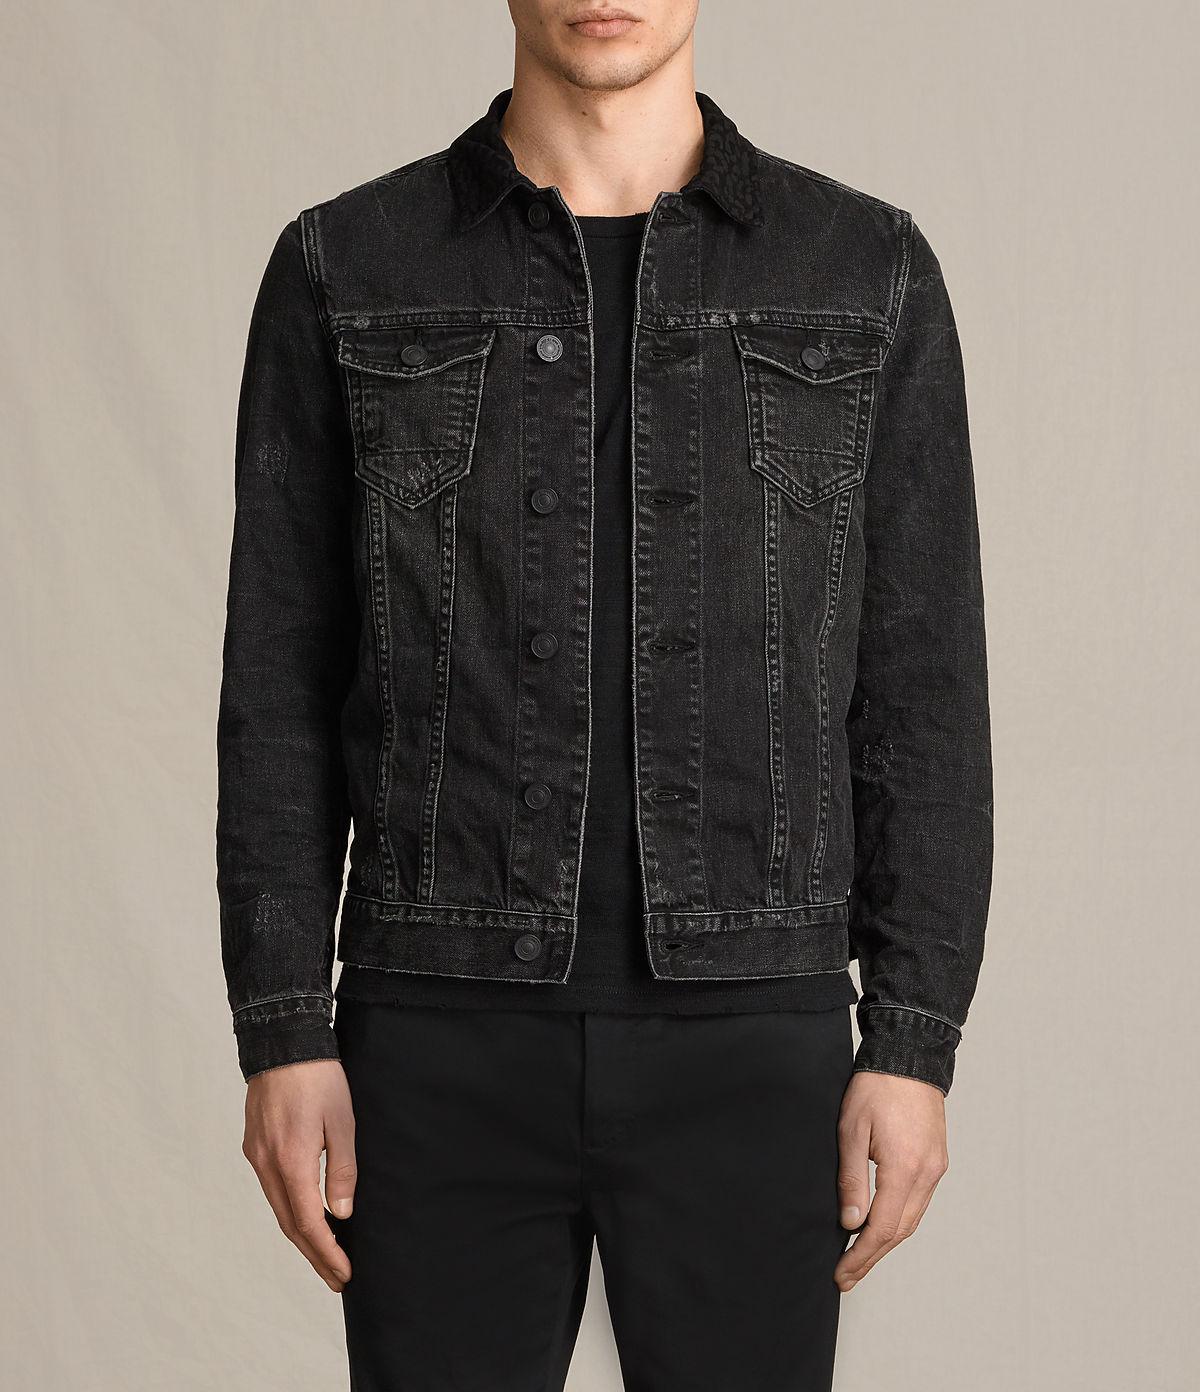 ALLSAINTS UK: Mens Donlington Denim Jacket (Black)